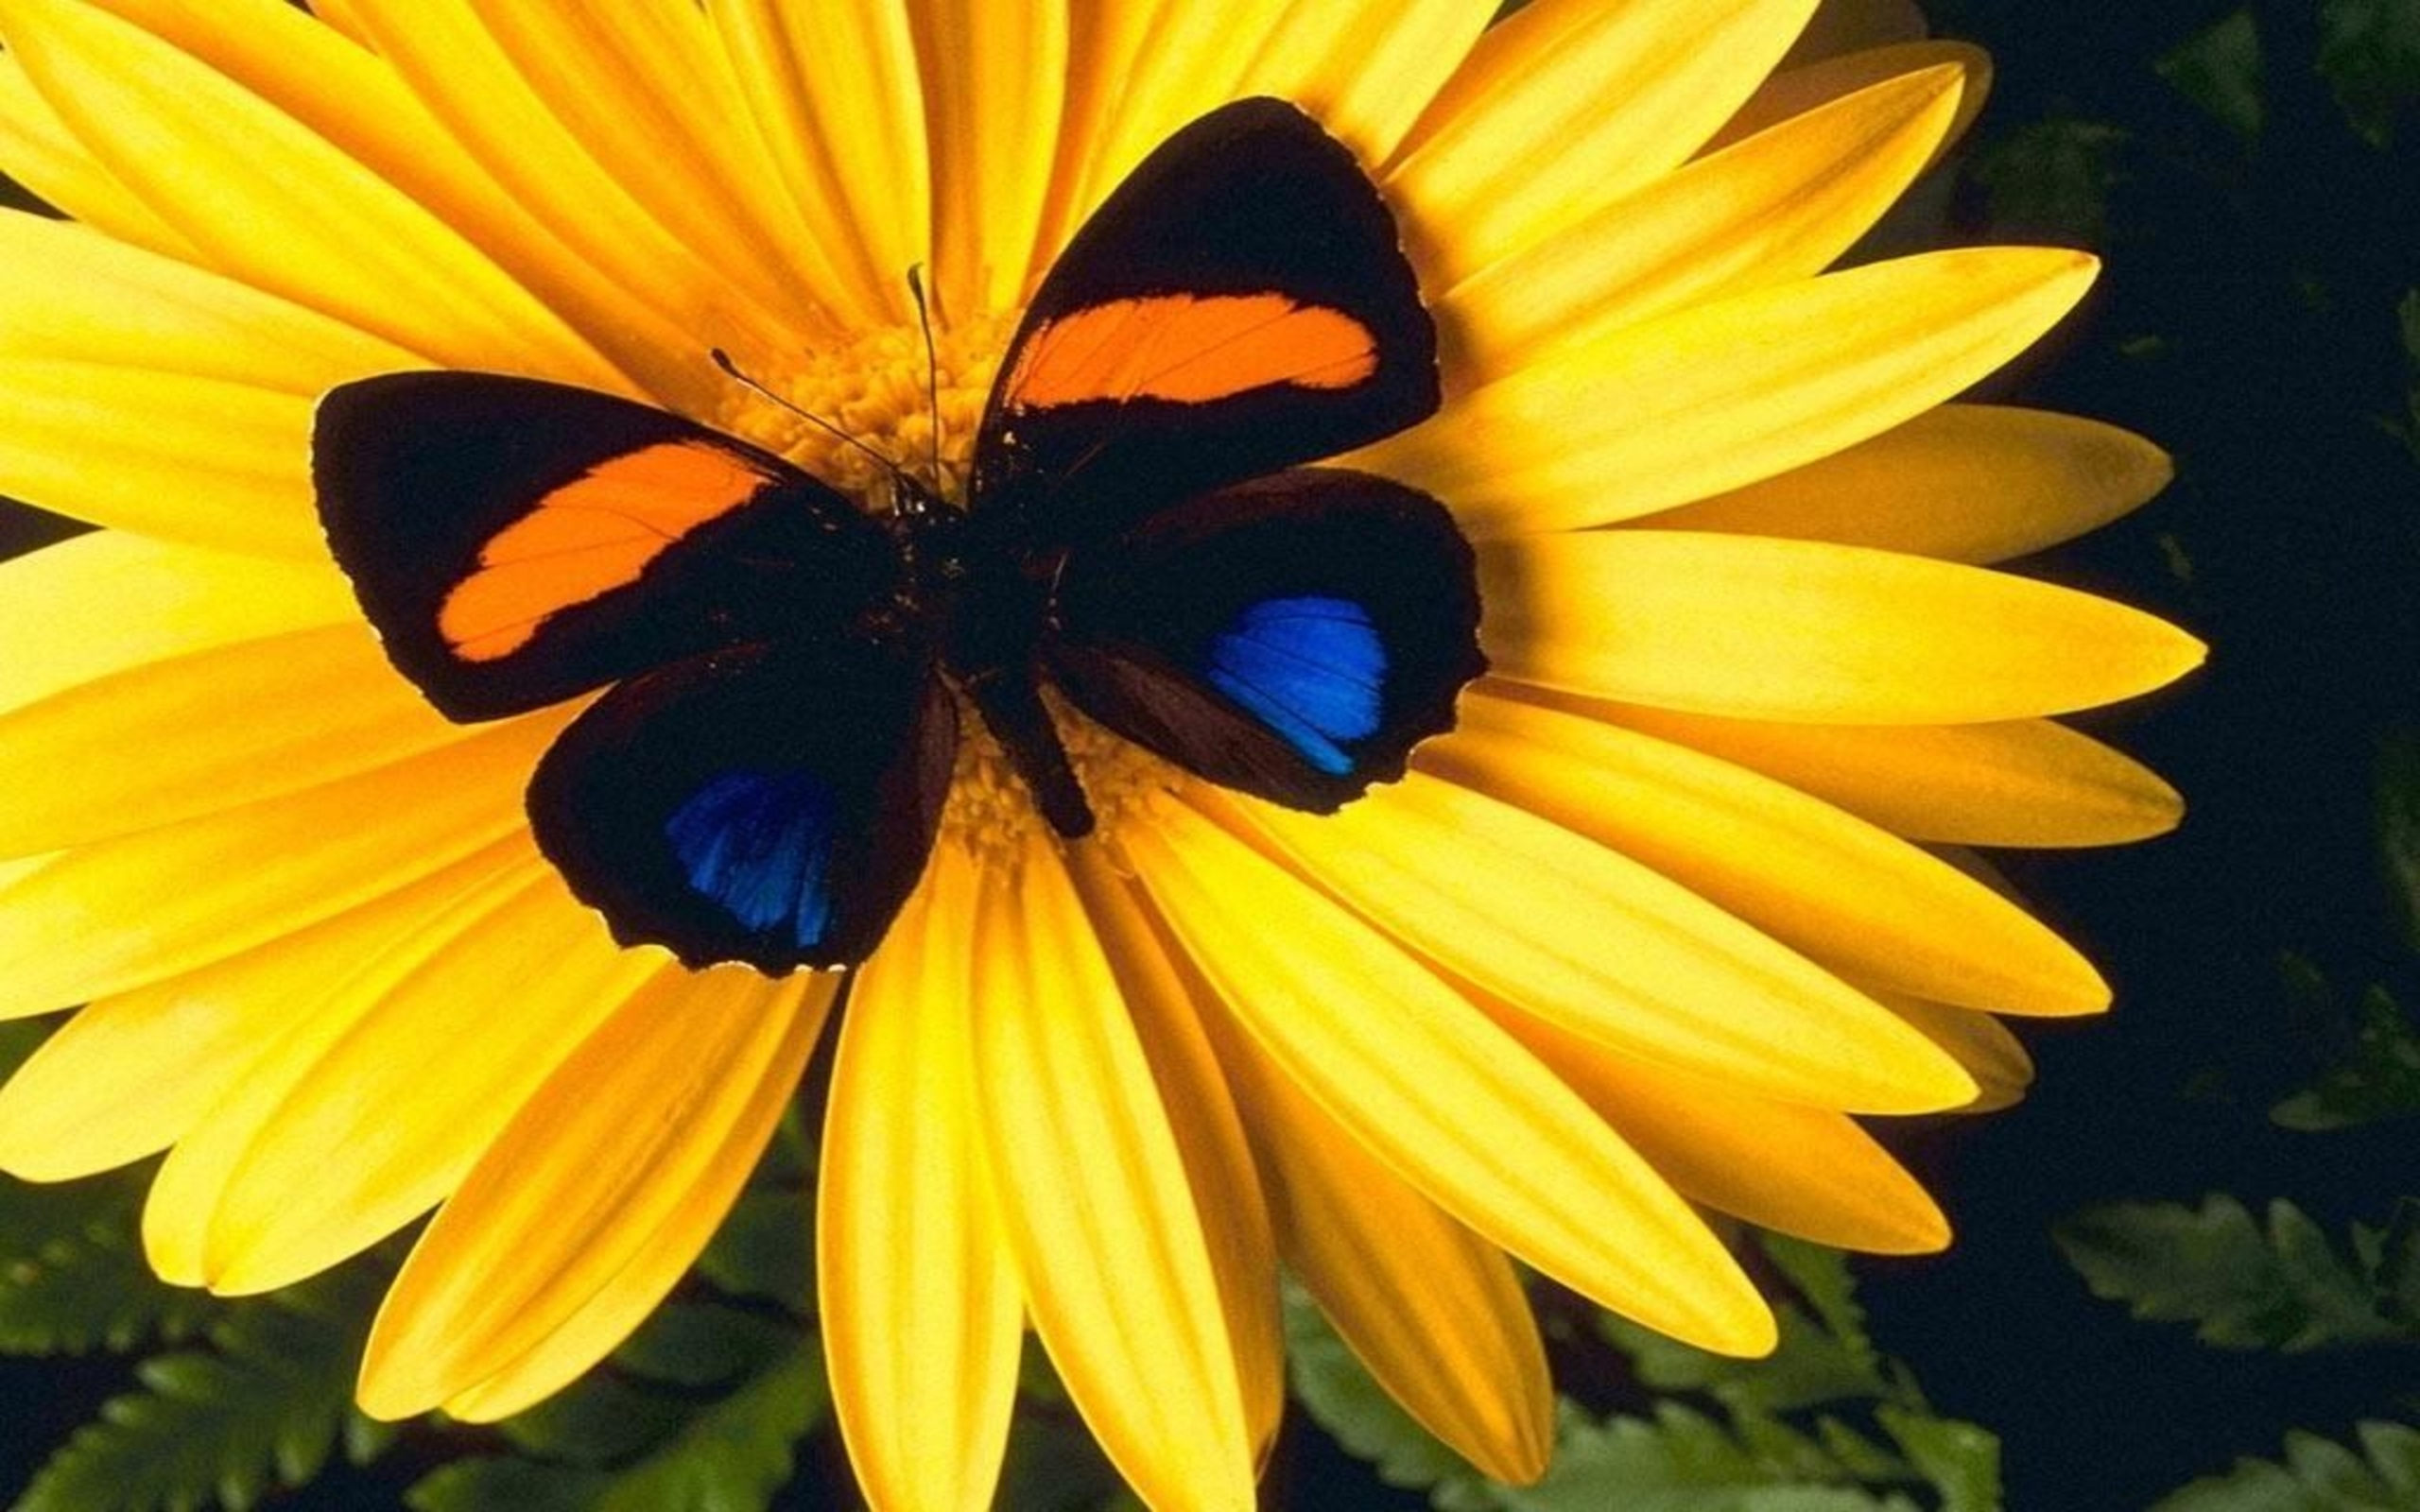 Butterfly Sitting On A Flower , HD Wallpaper & Backgrounds